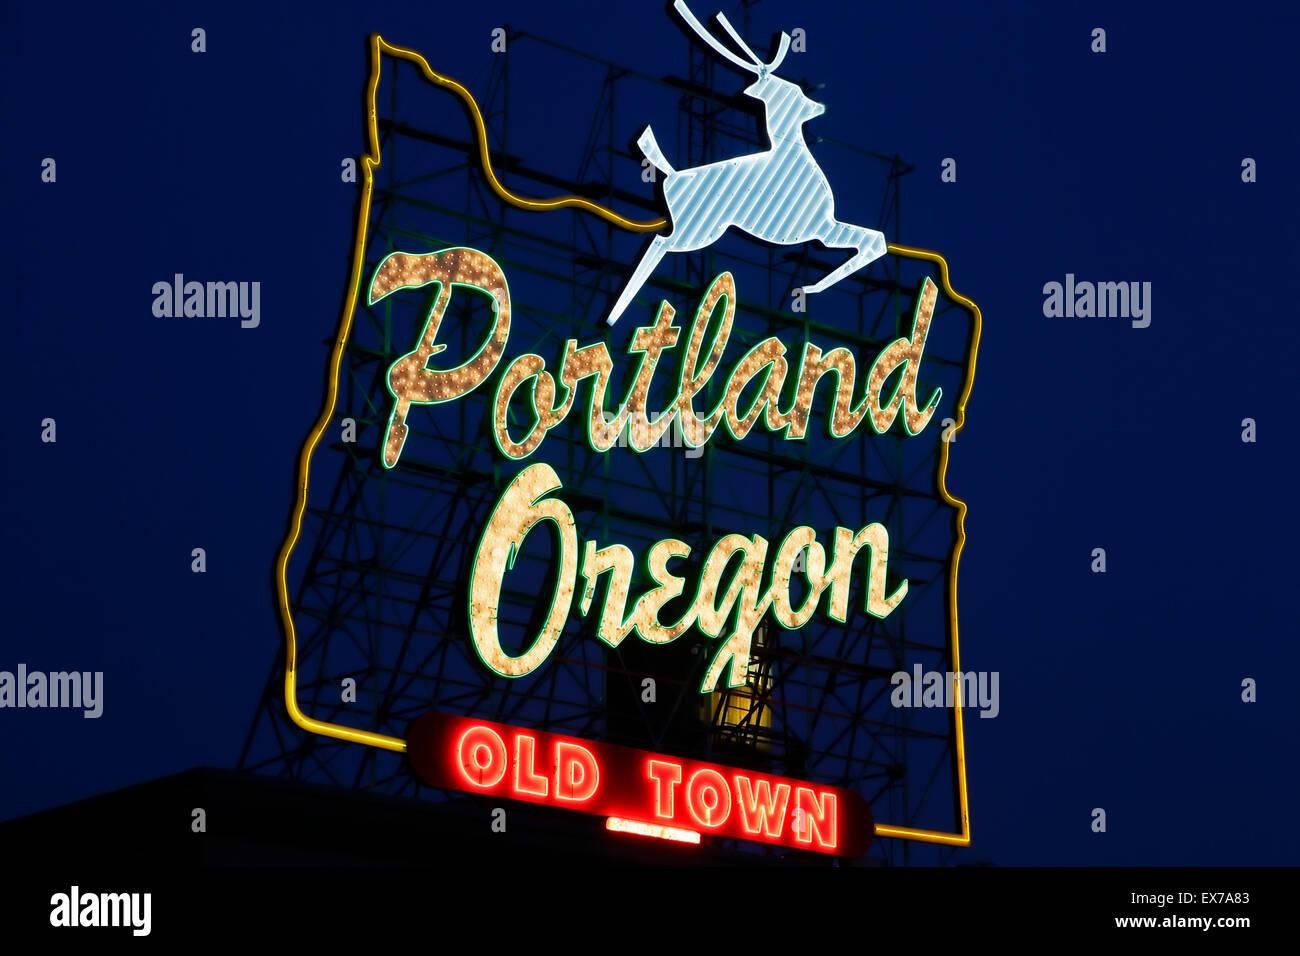 'Portland Oregon Old Town' neon sign, Portland, Oregon USA - Stock Image